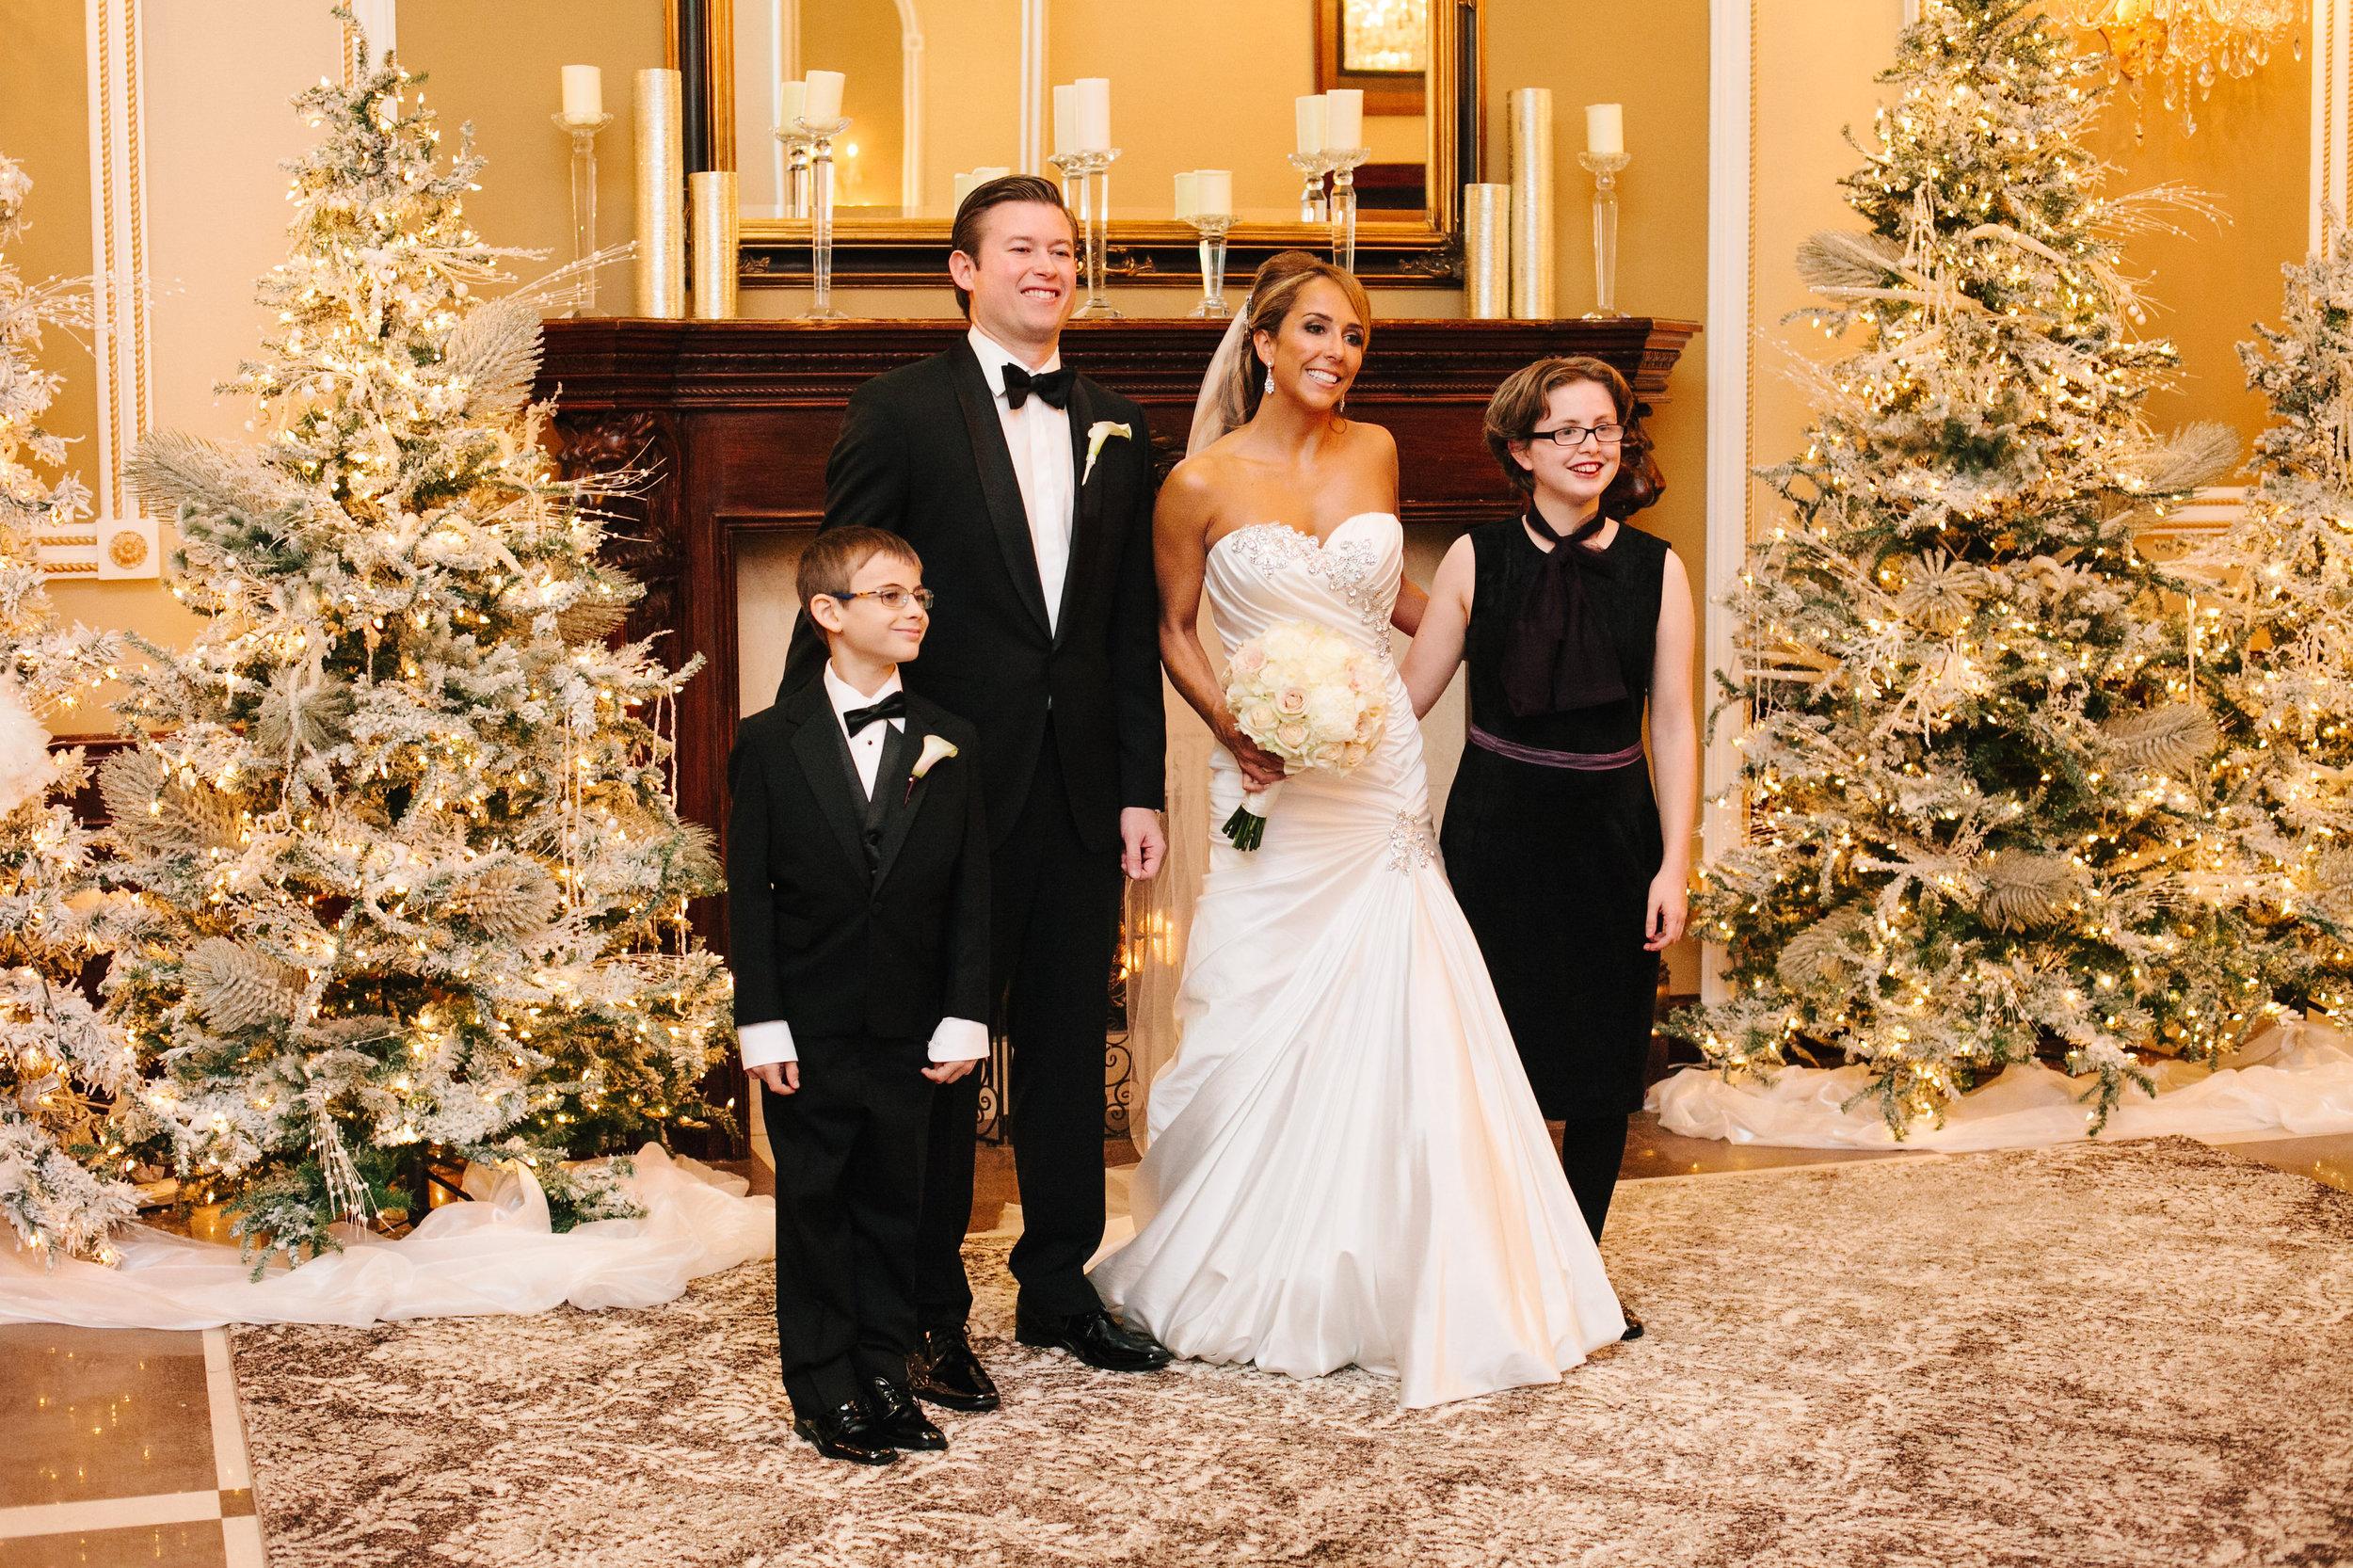 Ceci_New_York_Custom_Invitation_ New_Jersey_Wedding_Luxury_Personalized_Ceci_Style_Bride_Foil_Stamping149.JPG